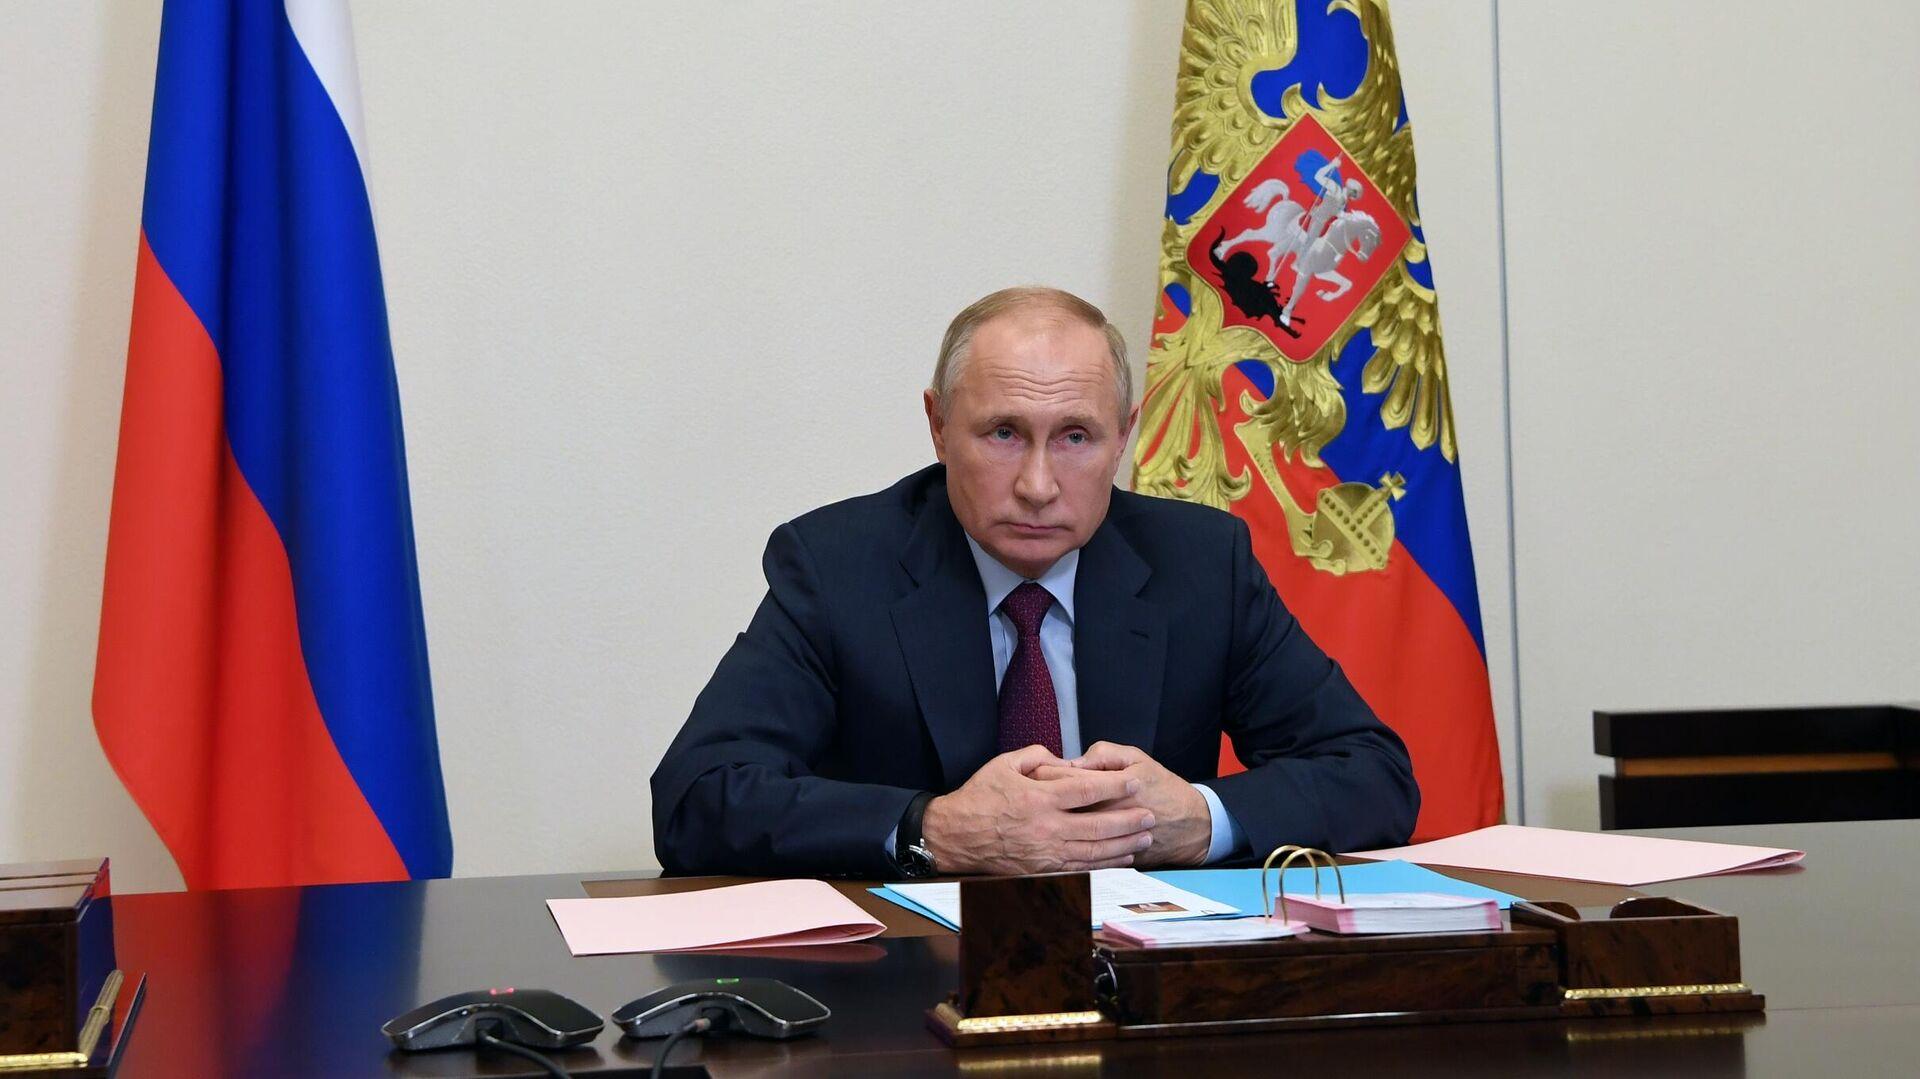 Президент РФ Владимир Путин - РИА Новости, 1920, 24.11.2020